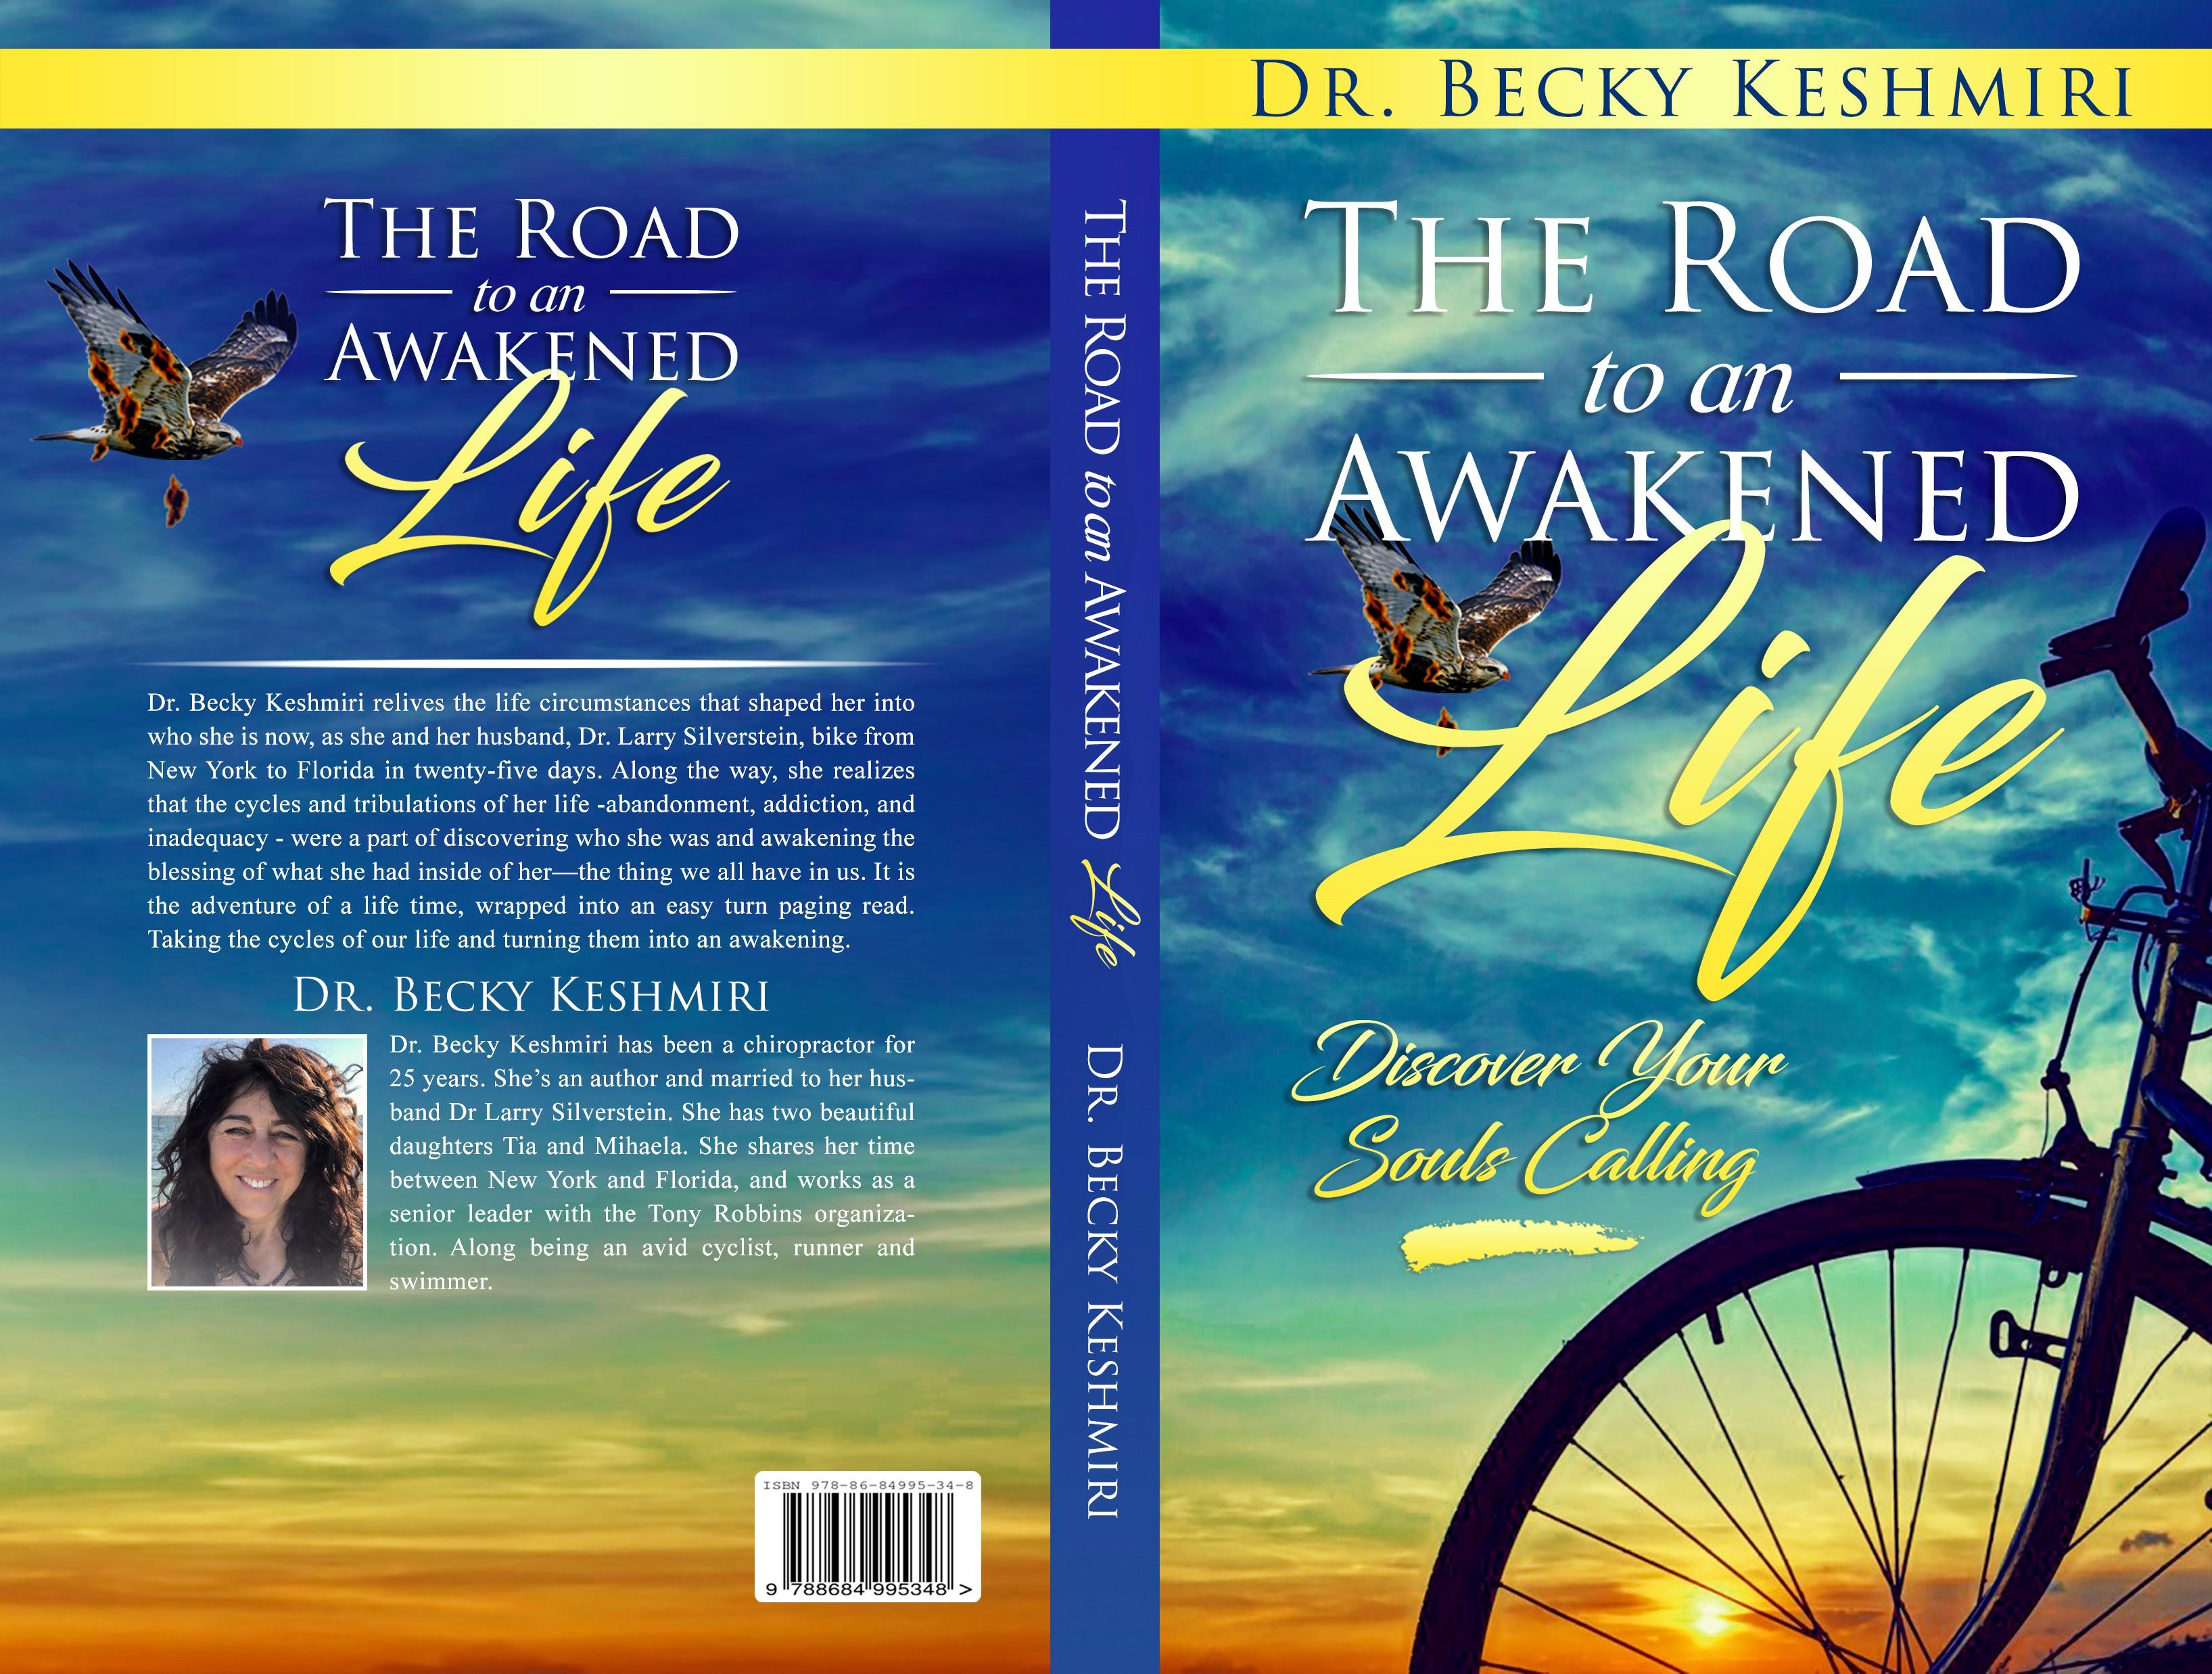 The Road to an Awakened Life